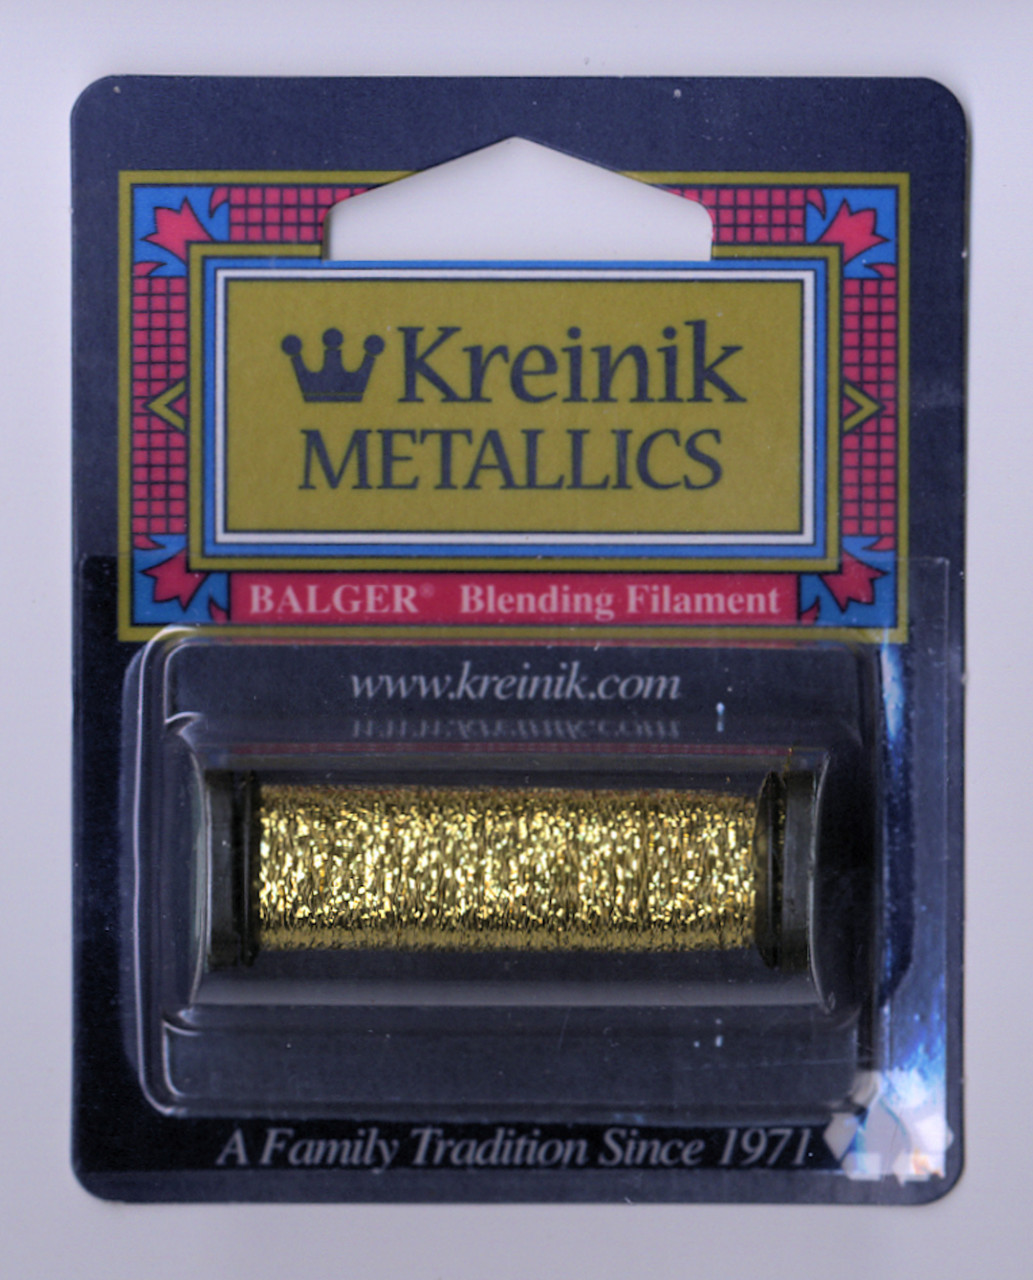 Kreinik Metallics Blending Filament - Gold (Hi Lustre) #002HL